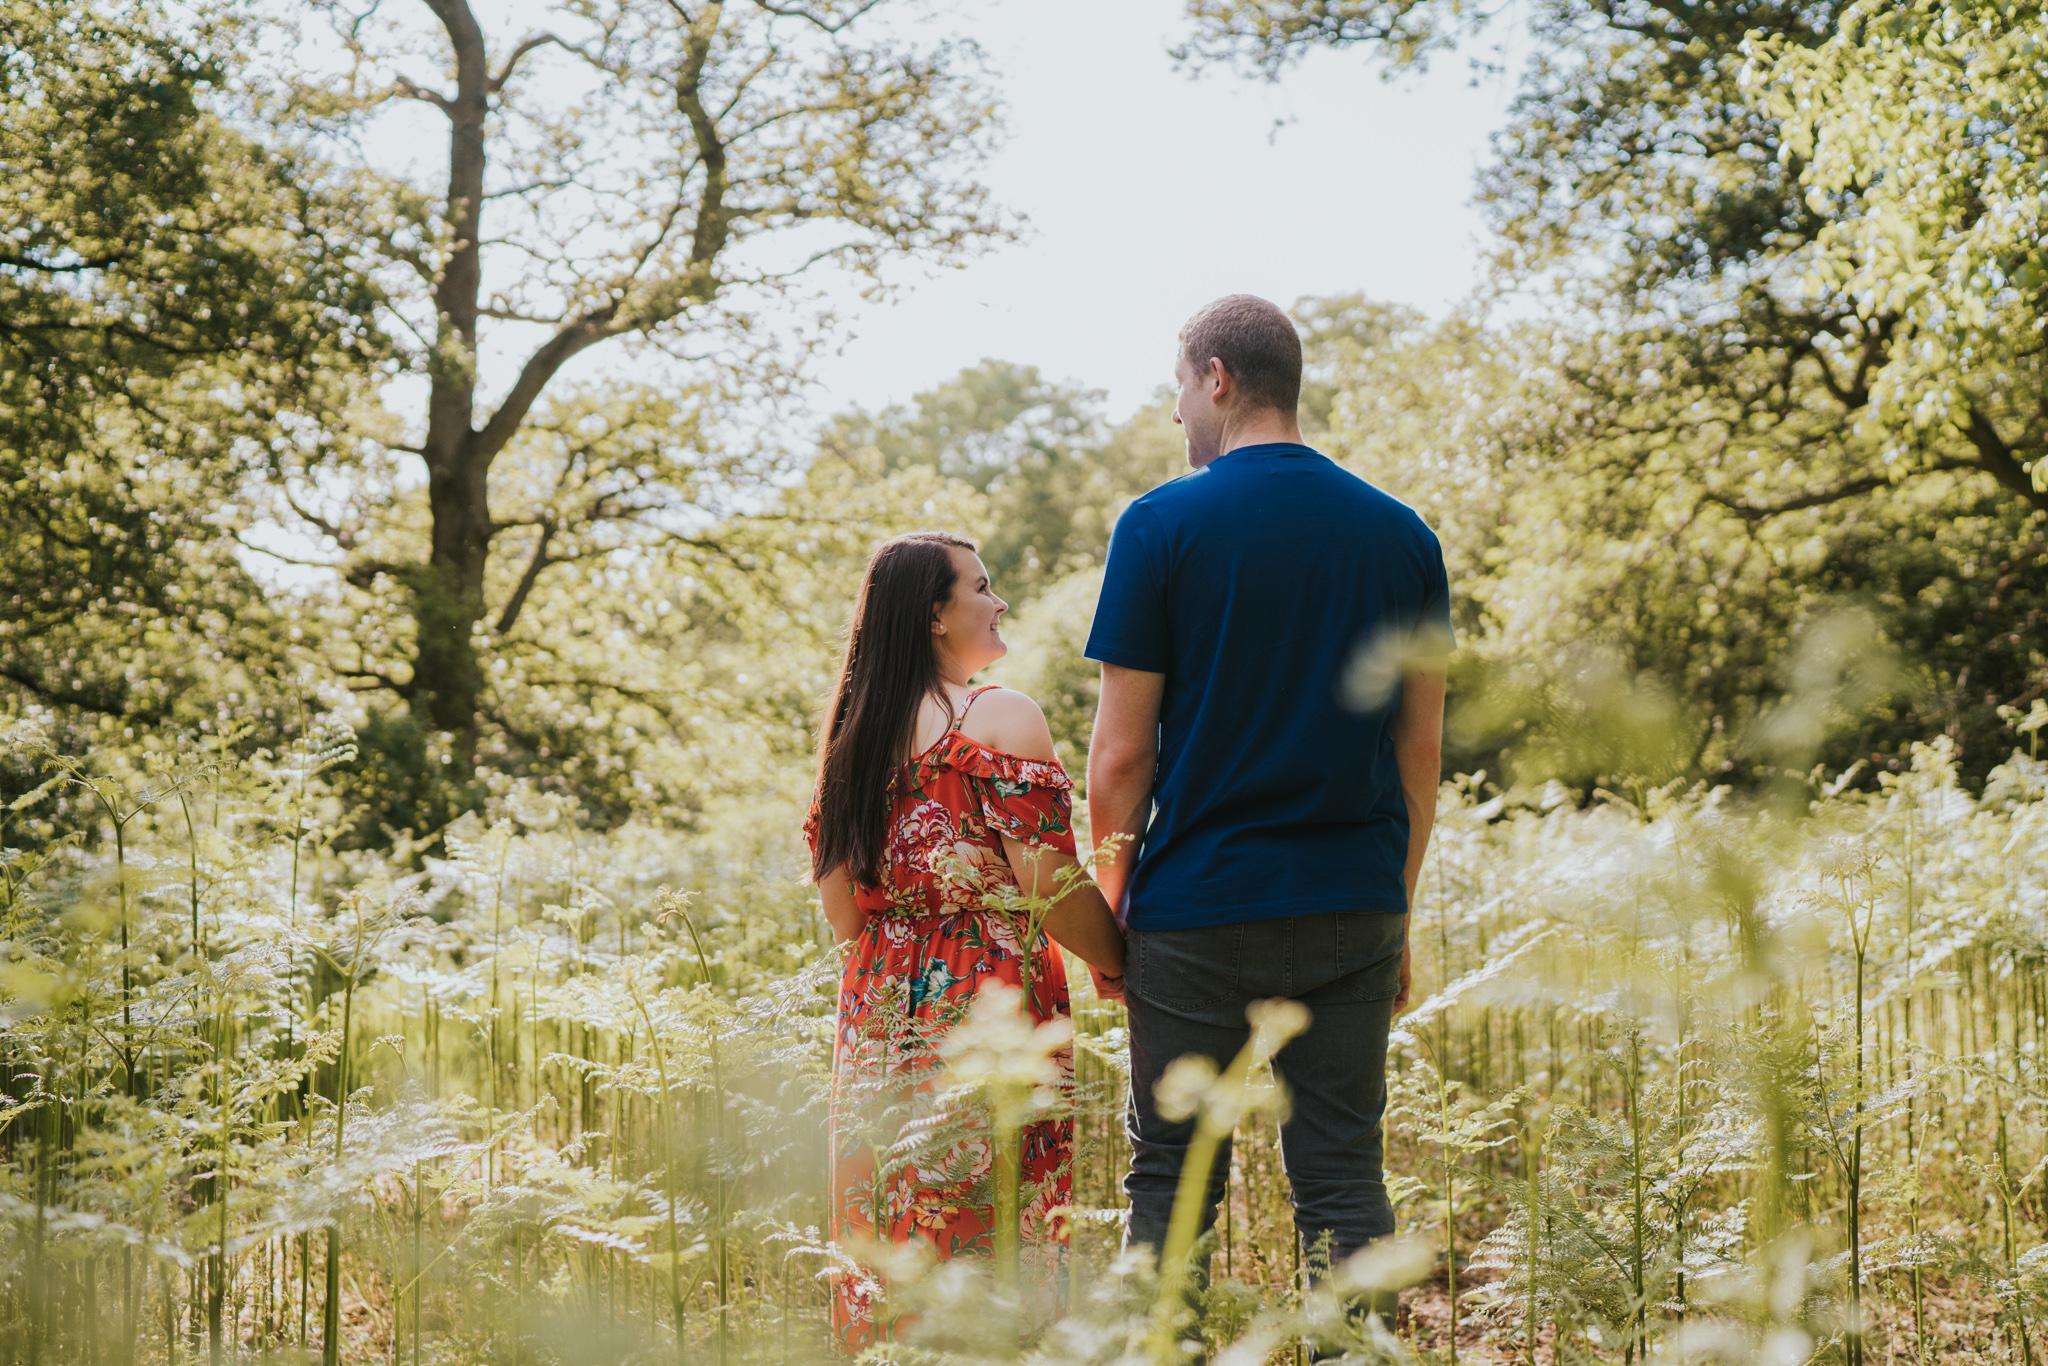 emily-dom-pre-wedding-session-west-bergholt-colchester-grace-elizabeth-colchester-essex-alternative-wedding-lifestyle-photographer-essex-suffolk-norfolk-devon (10 of 34).jpg